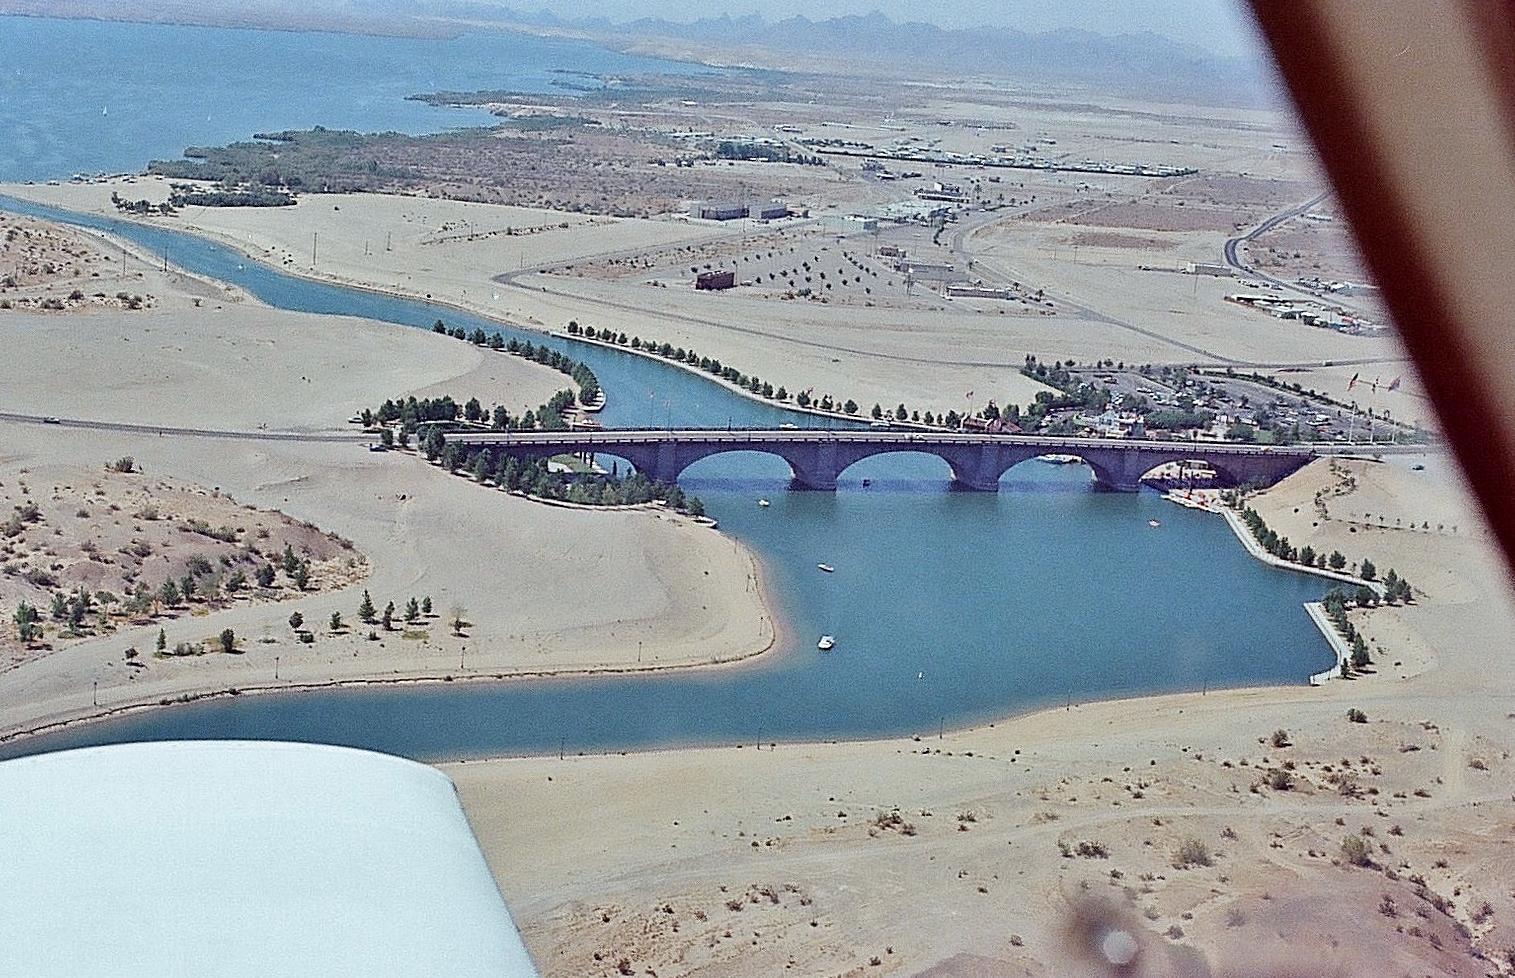 London Bridge on Lake Havasu, aerial view 1973